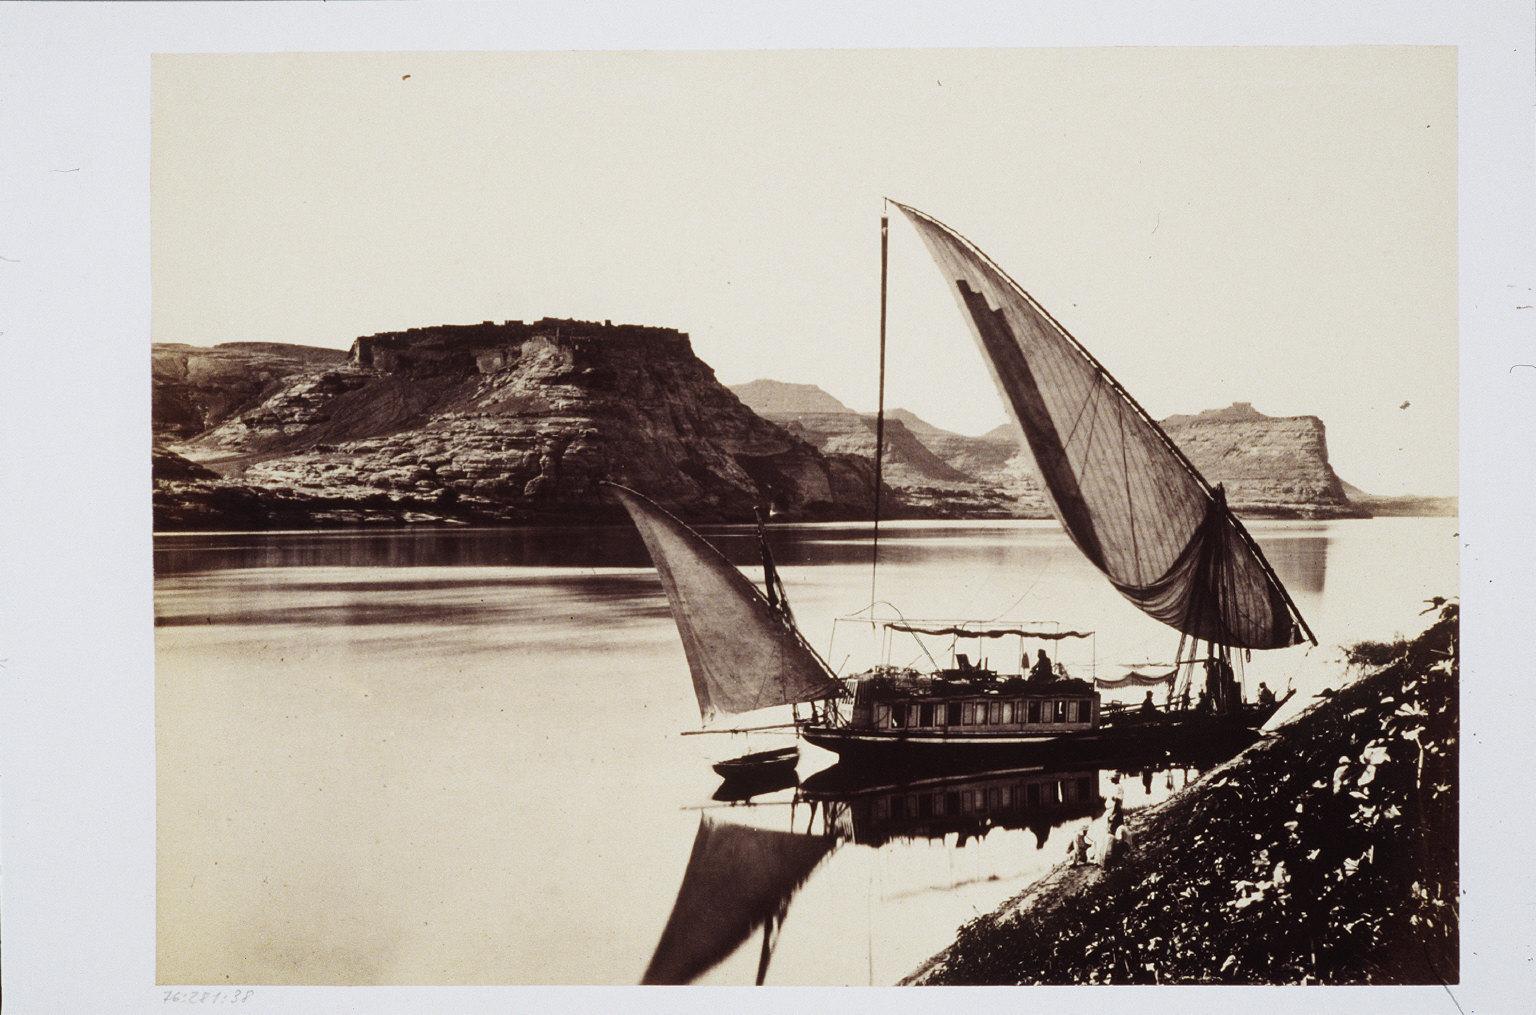 Travellers Boat at Ibrim